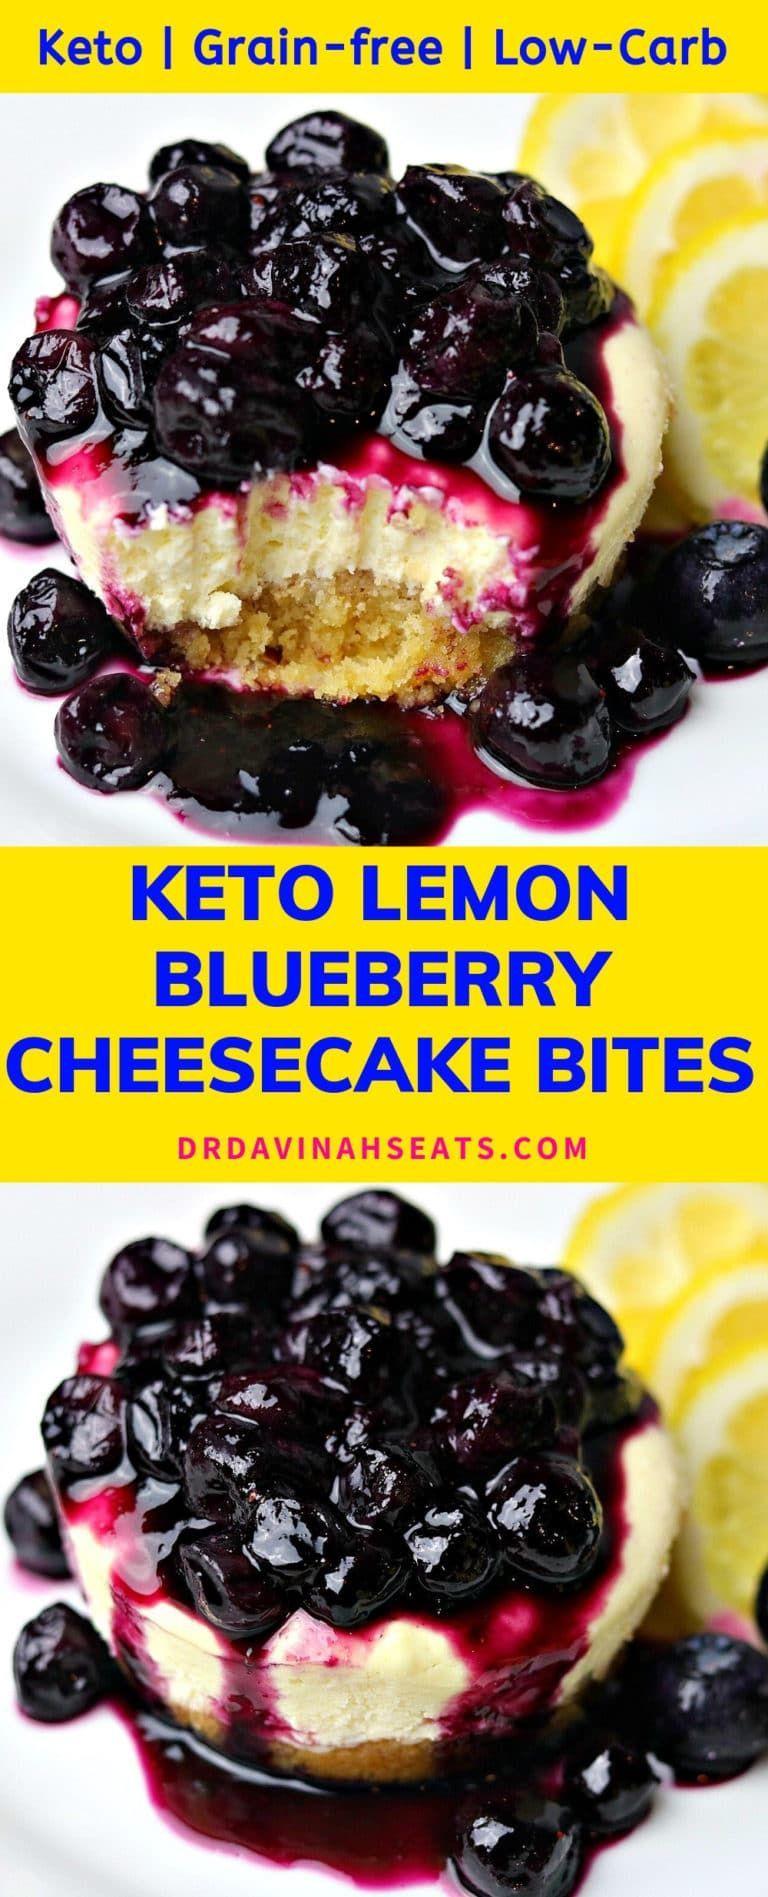 Keto & Low-Carb Lemon Blueberry Cheesecake Bites | Dr. Davinah's Eats